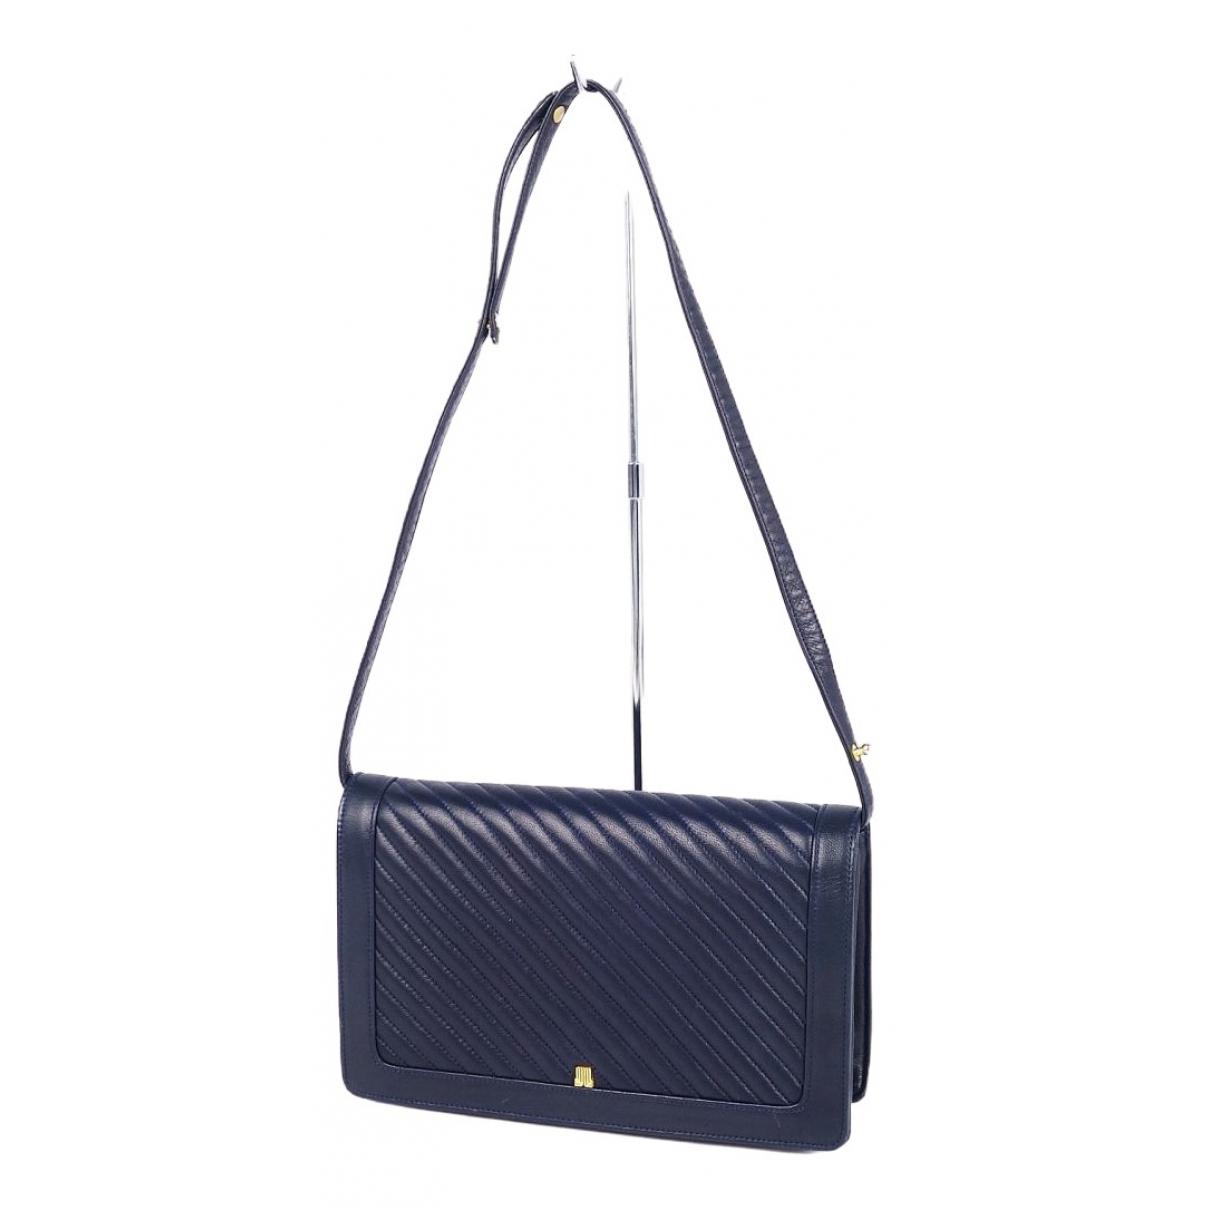 Lanvin \N Navy Leather handbag for Women \N